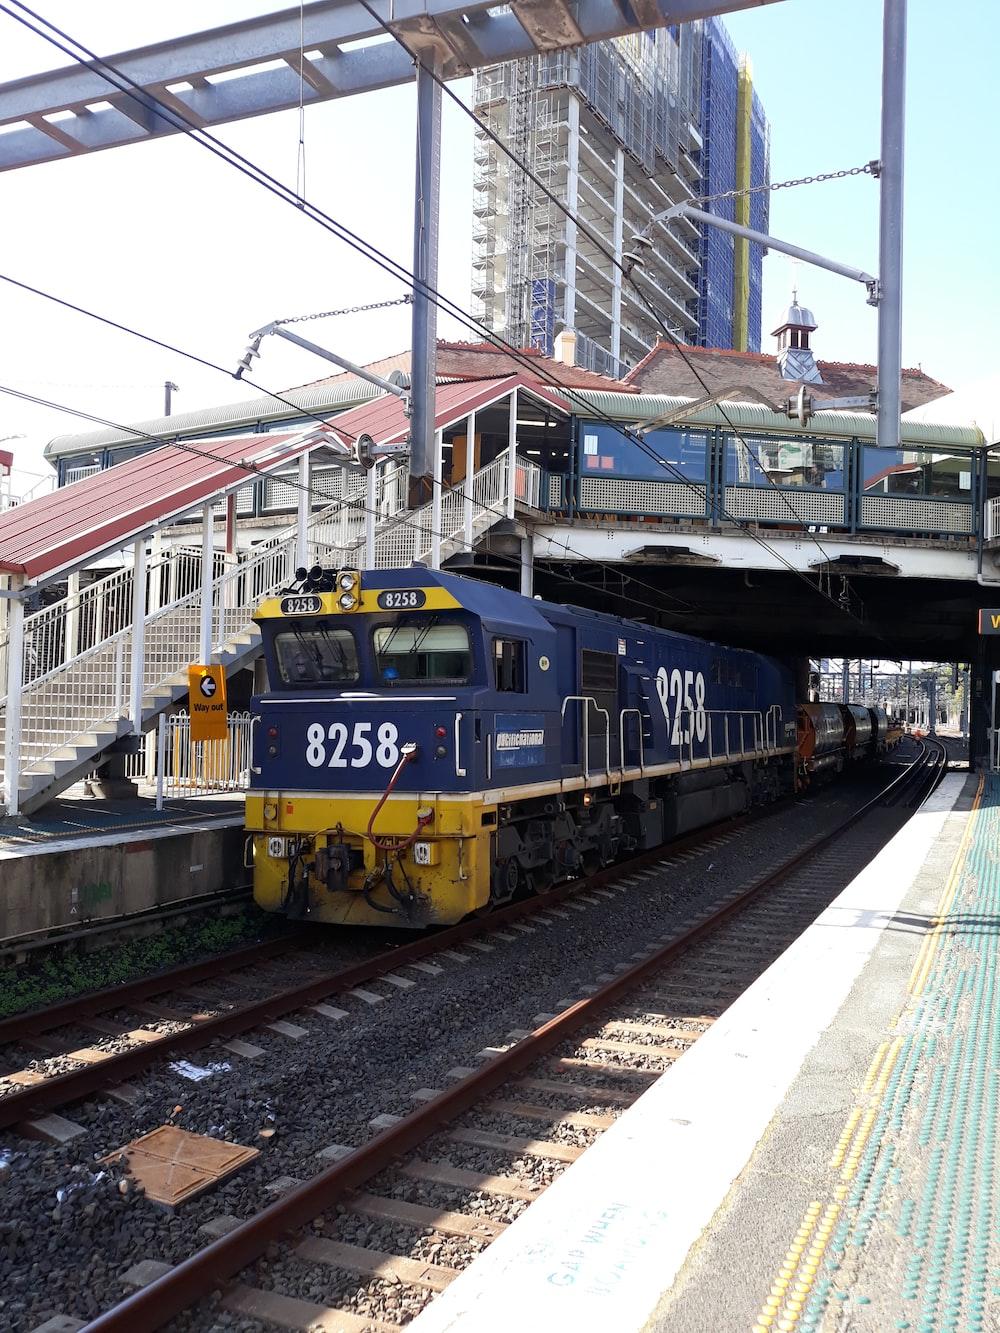 blue and yellow train on rail tracks